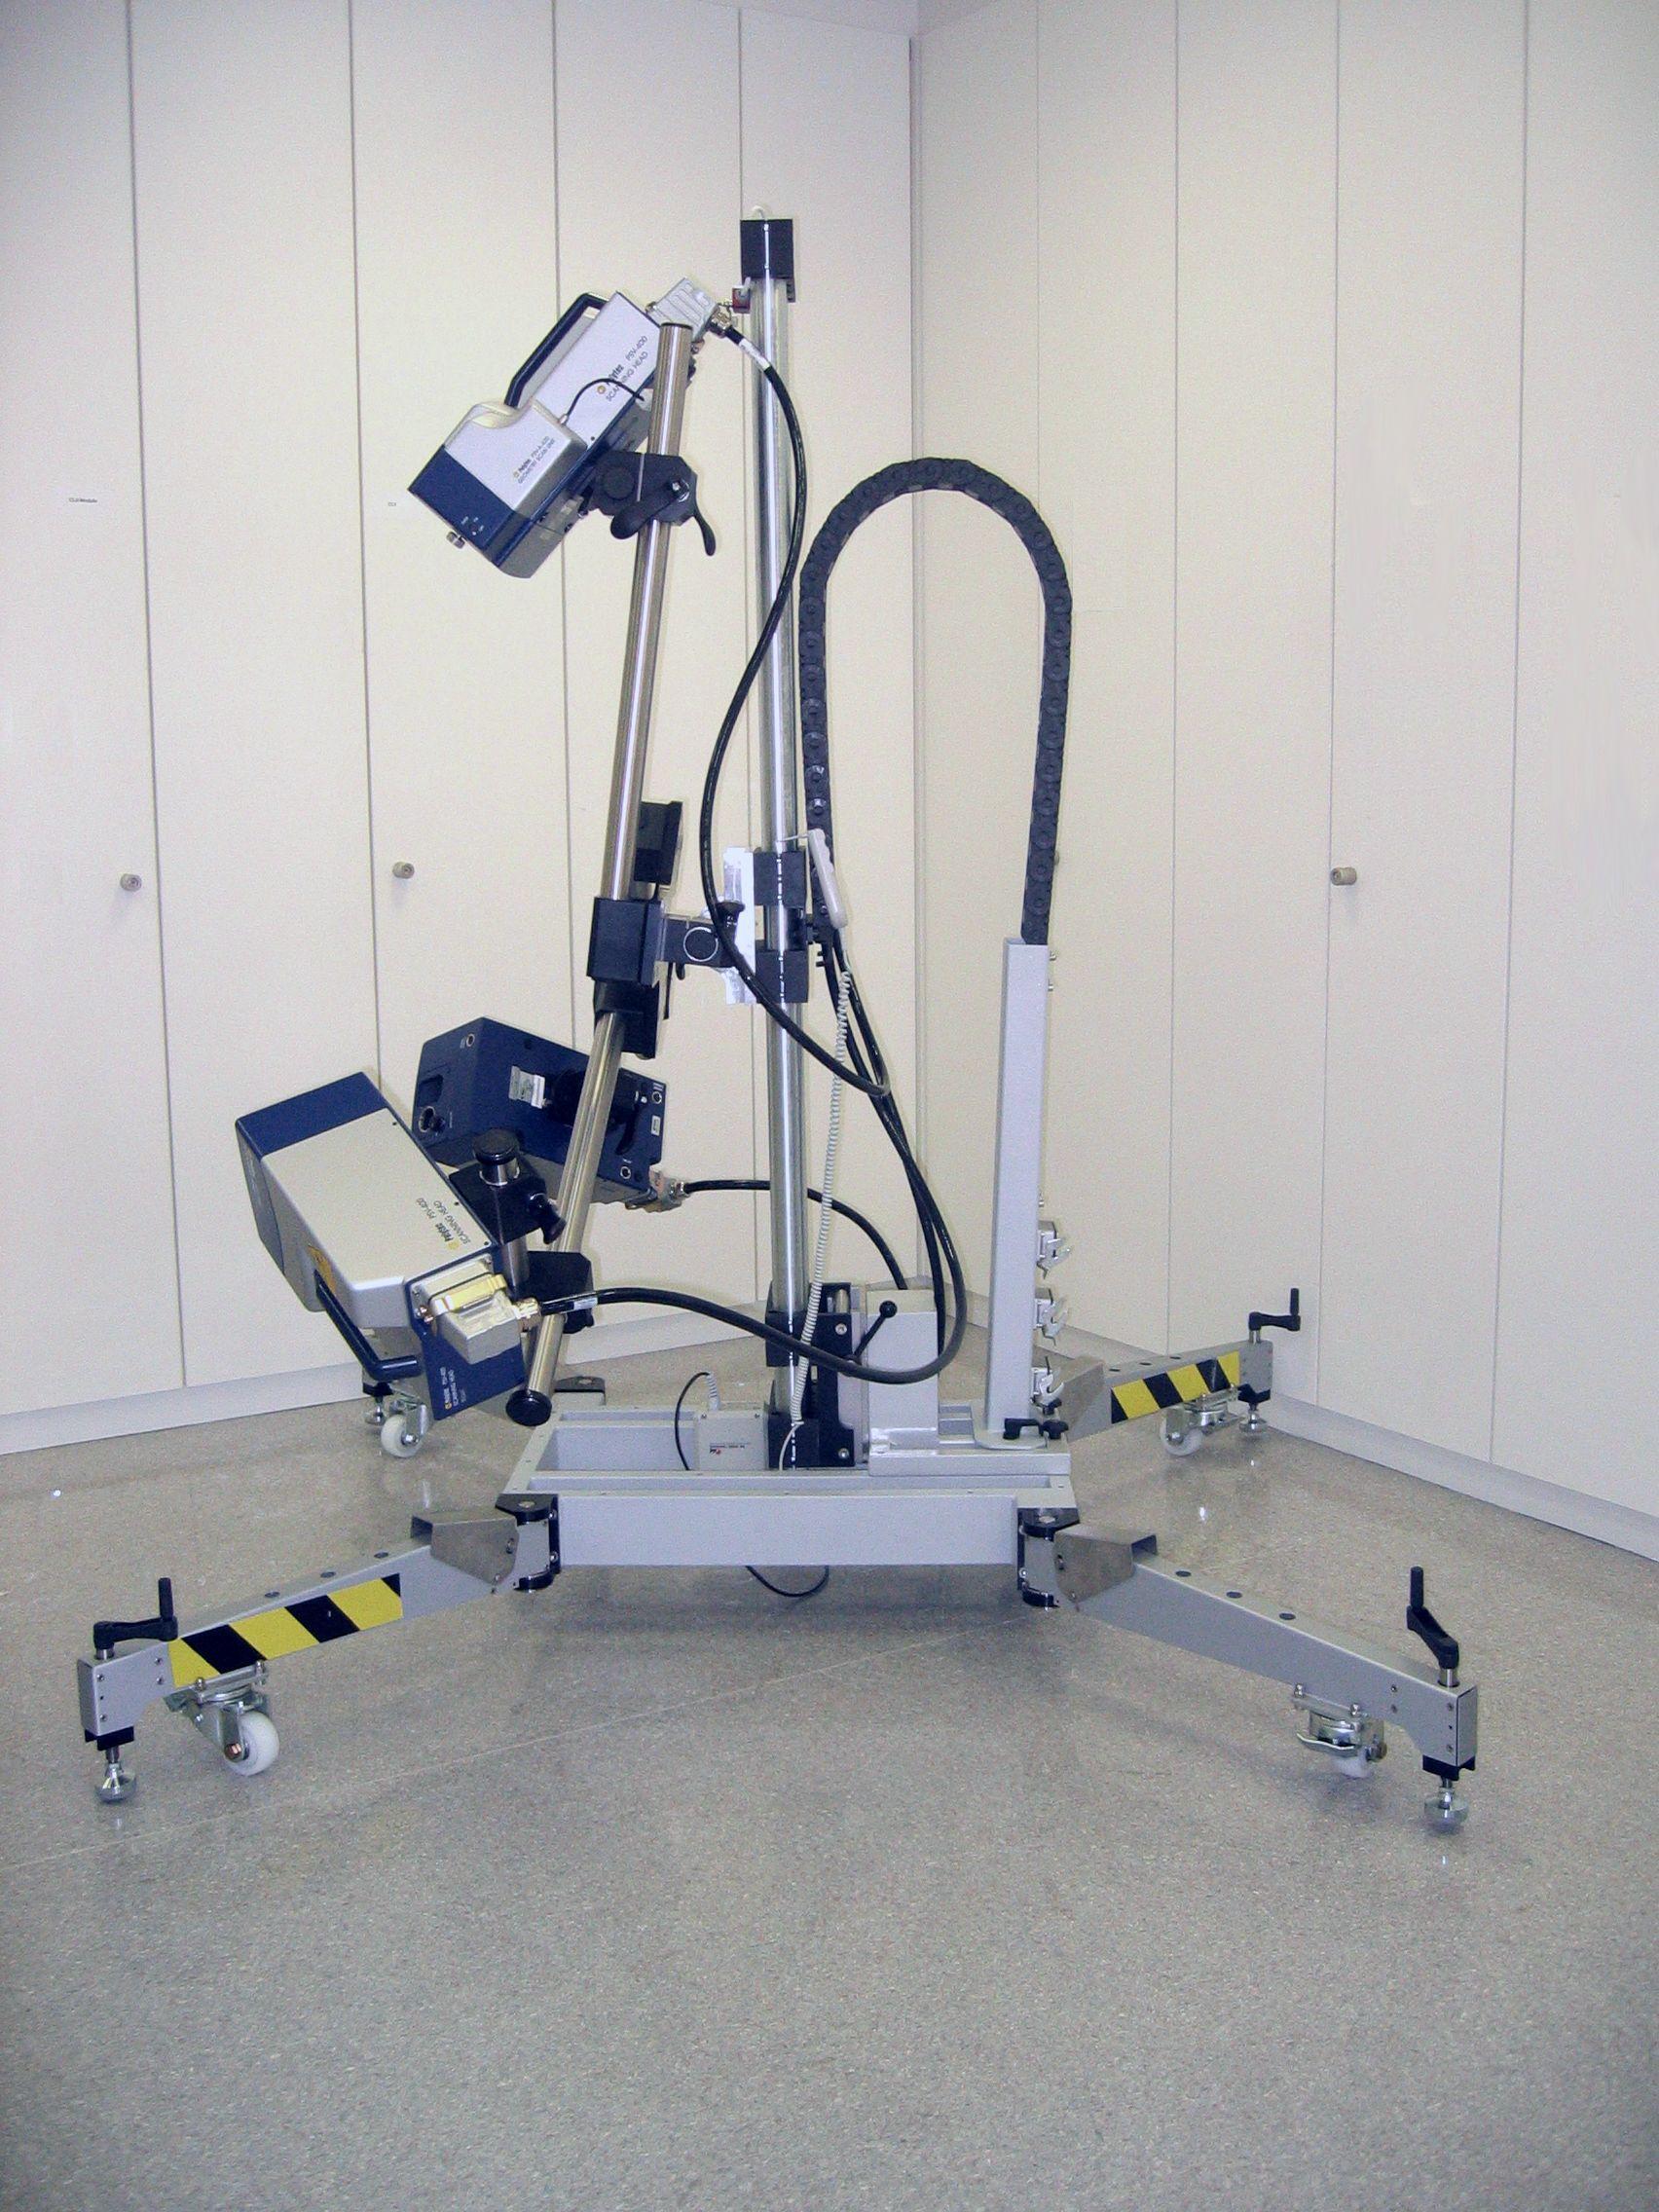 Laser scanning vibrometry - Wikipedia